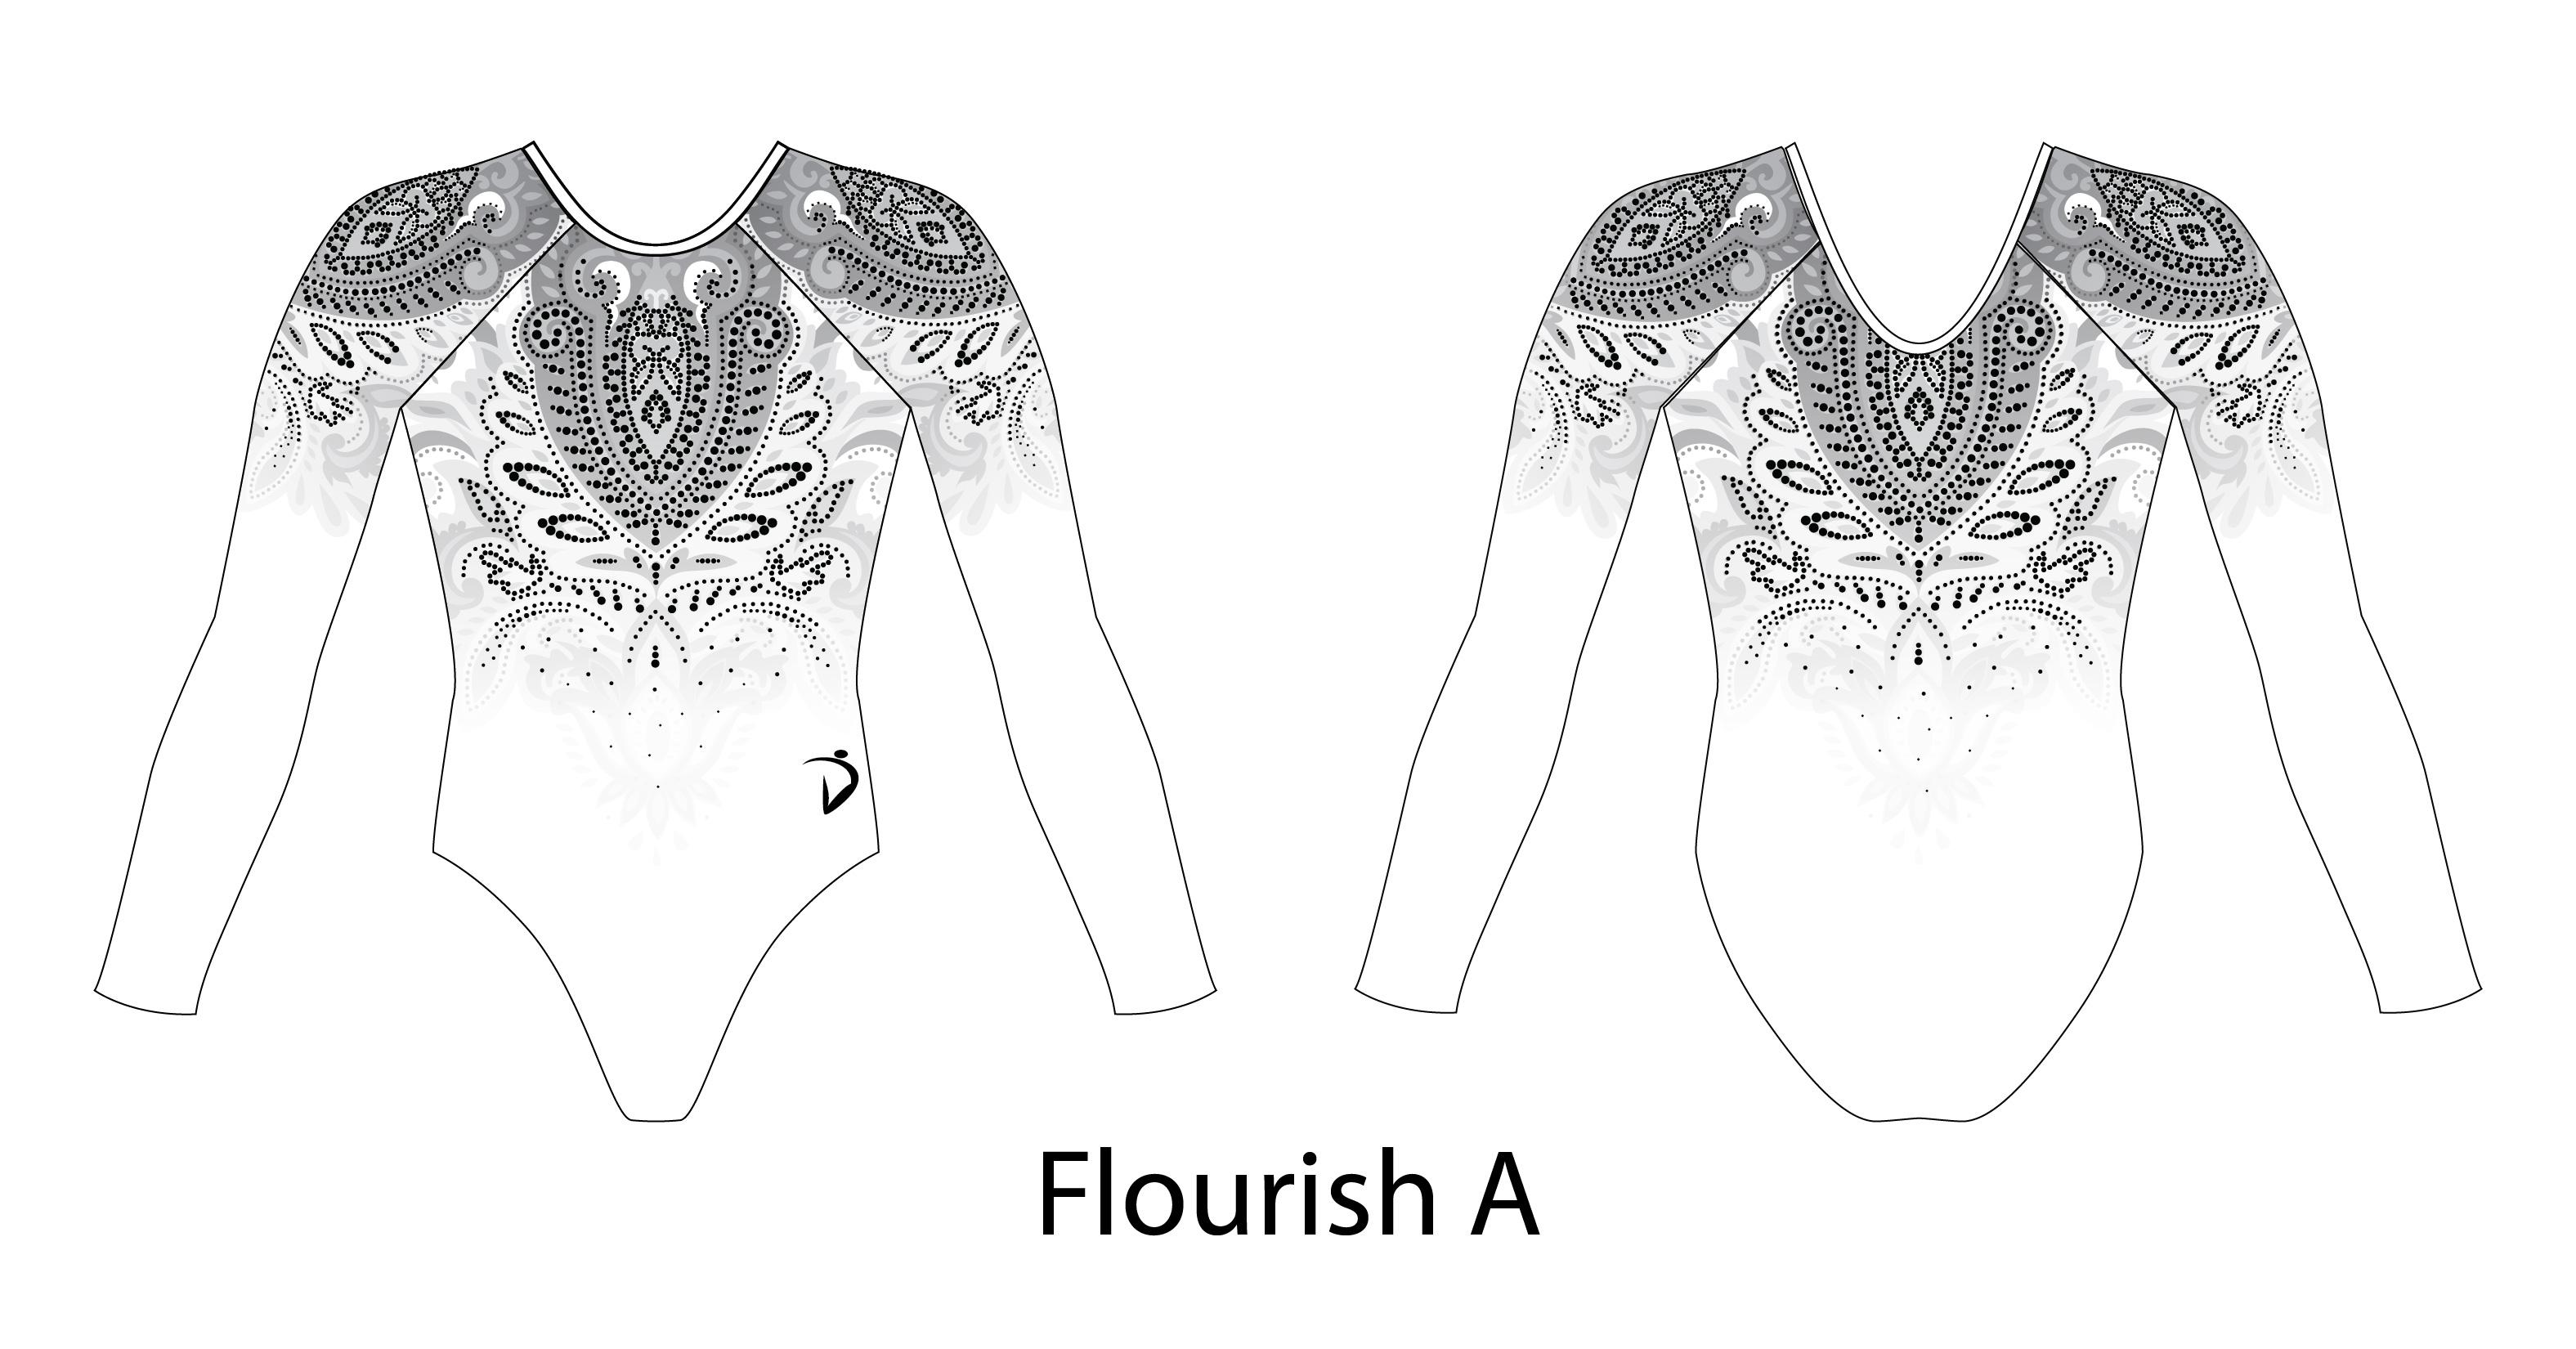 Flourish A